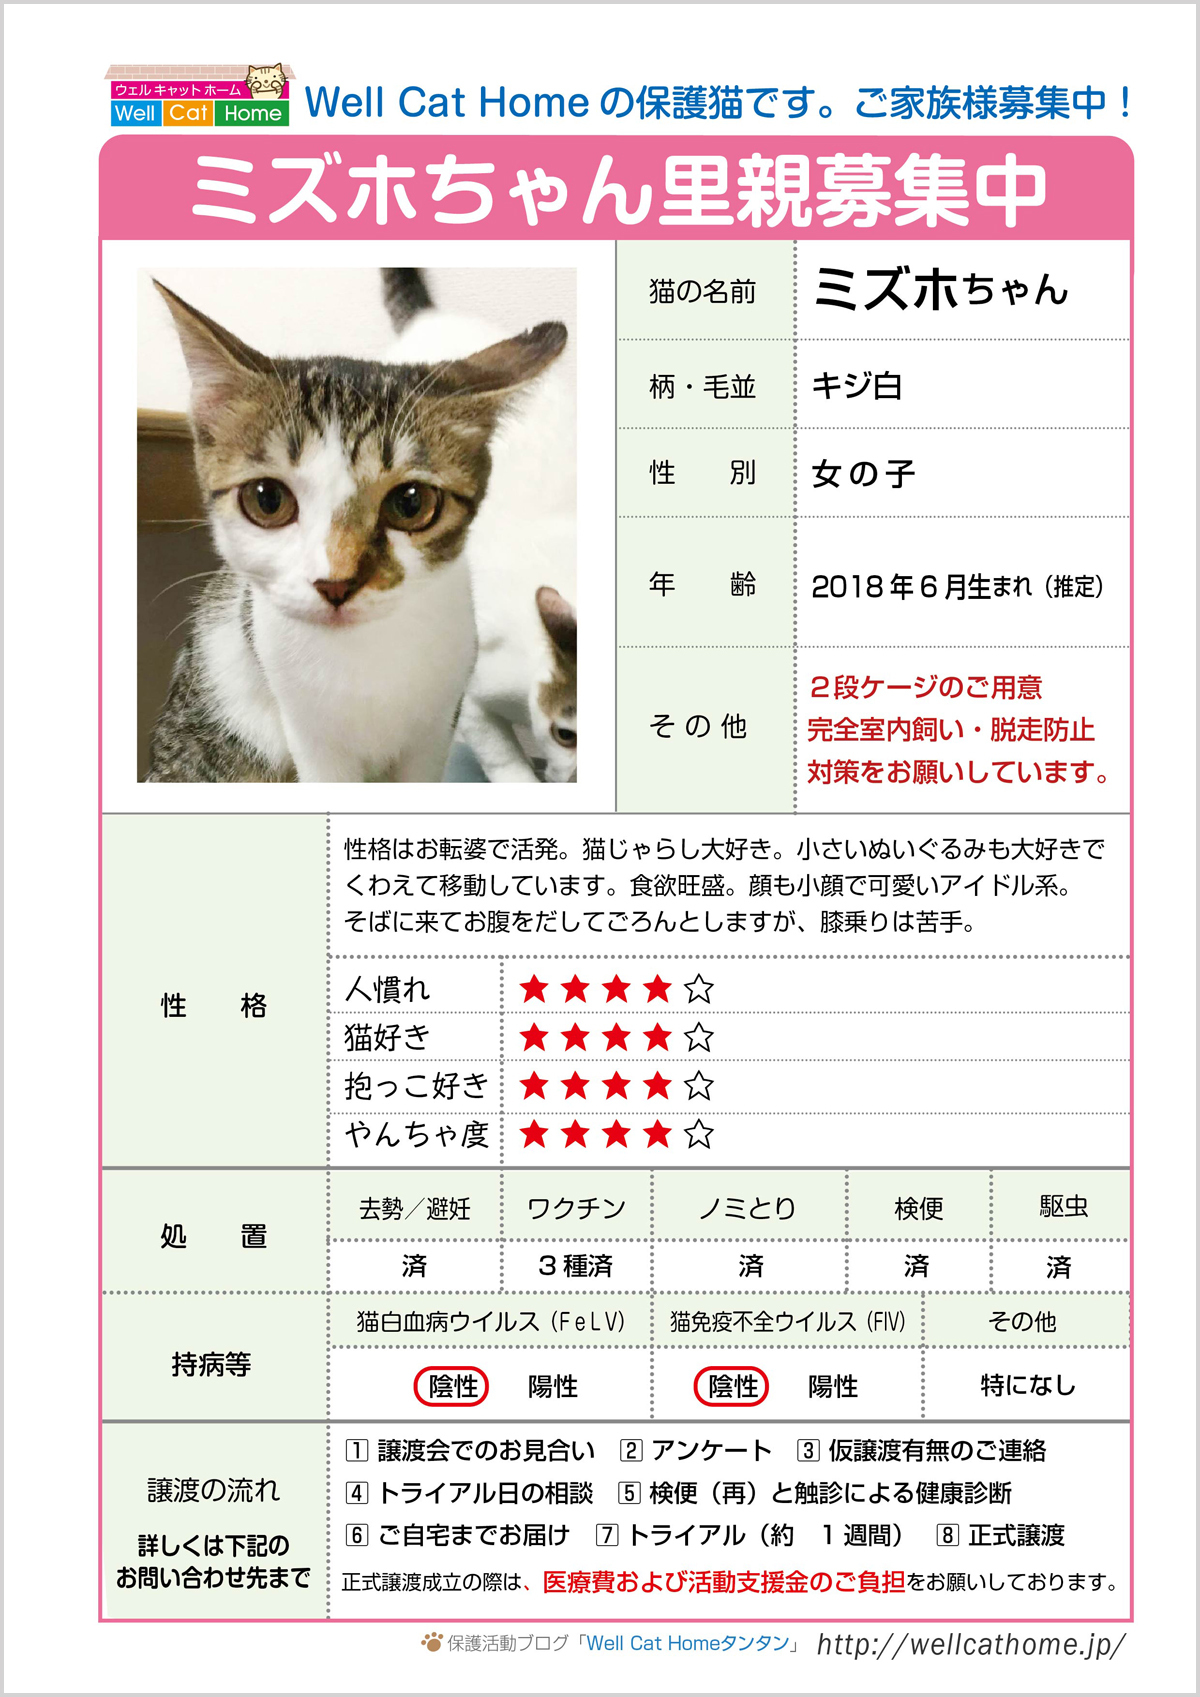 mizuho-profile1-1200.jpg